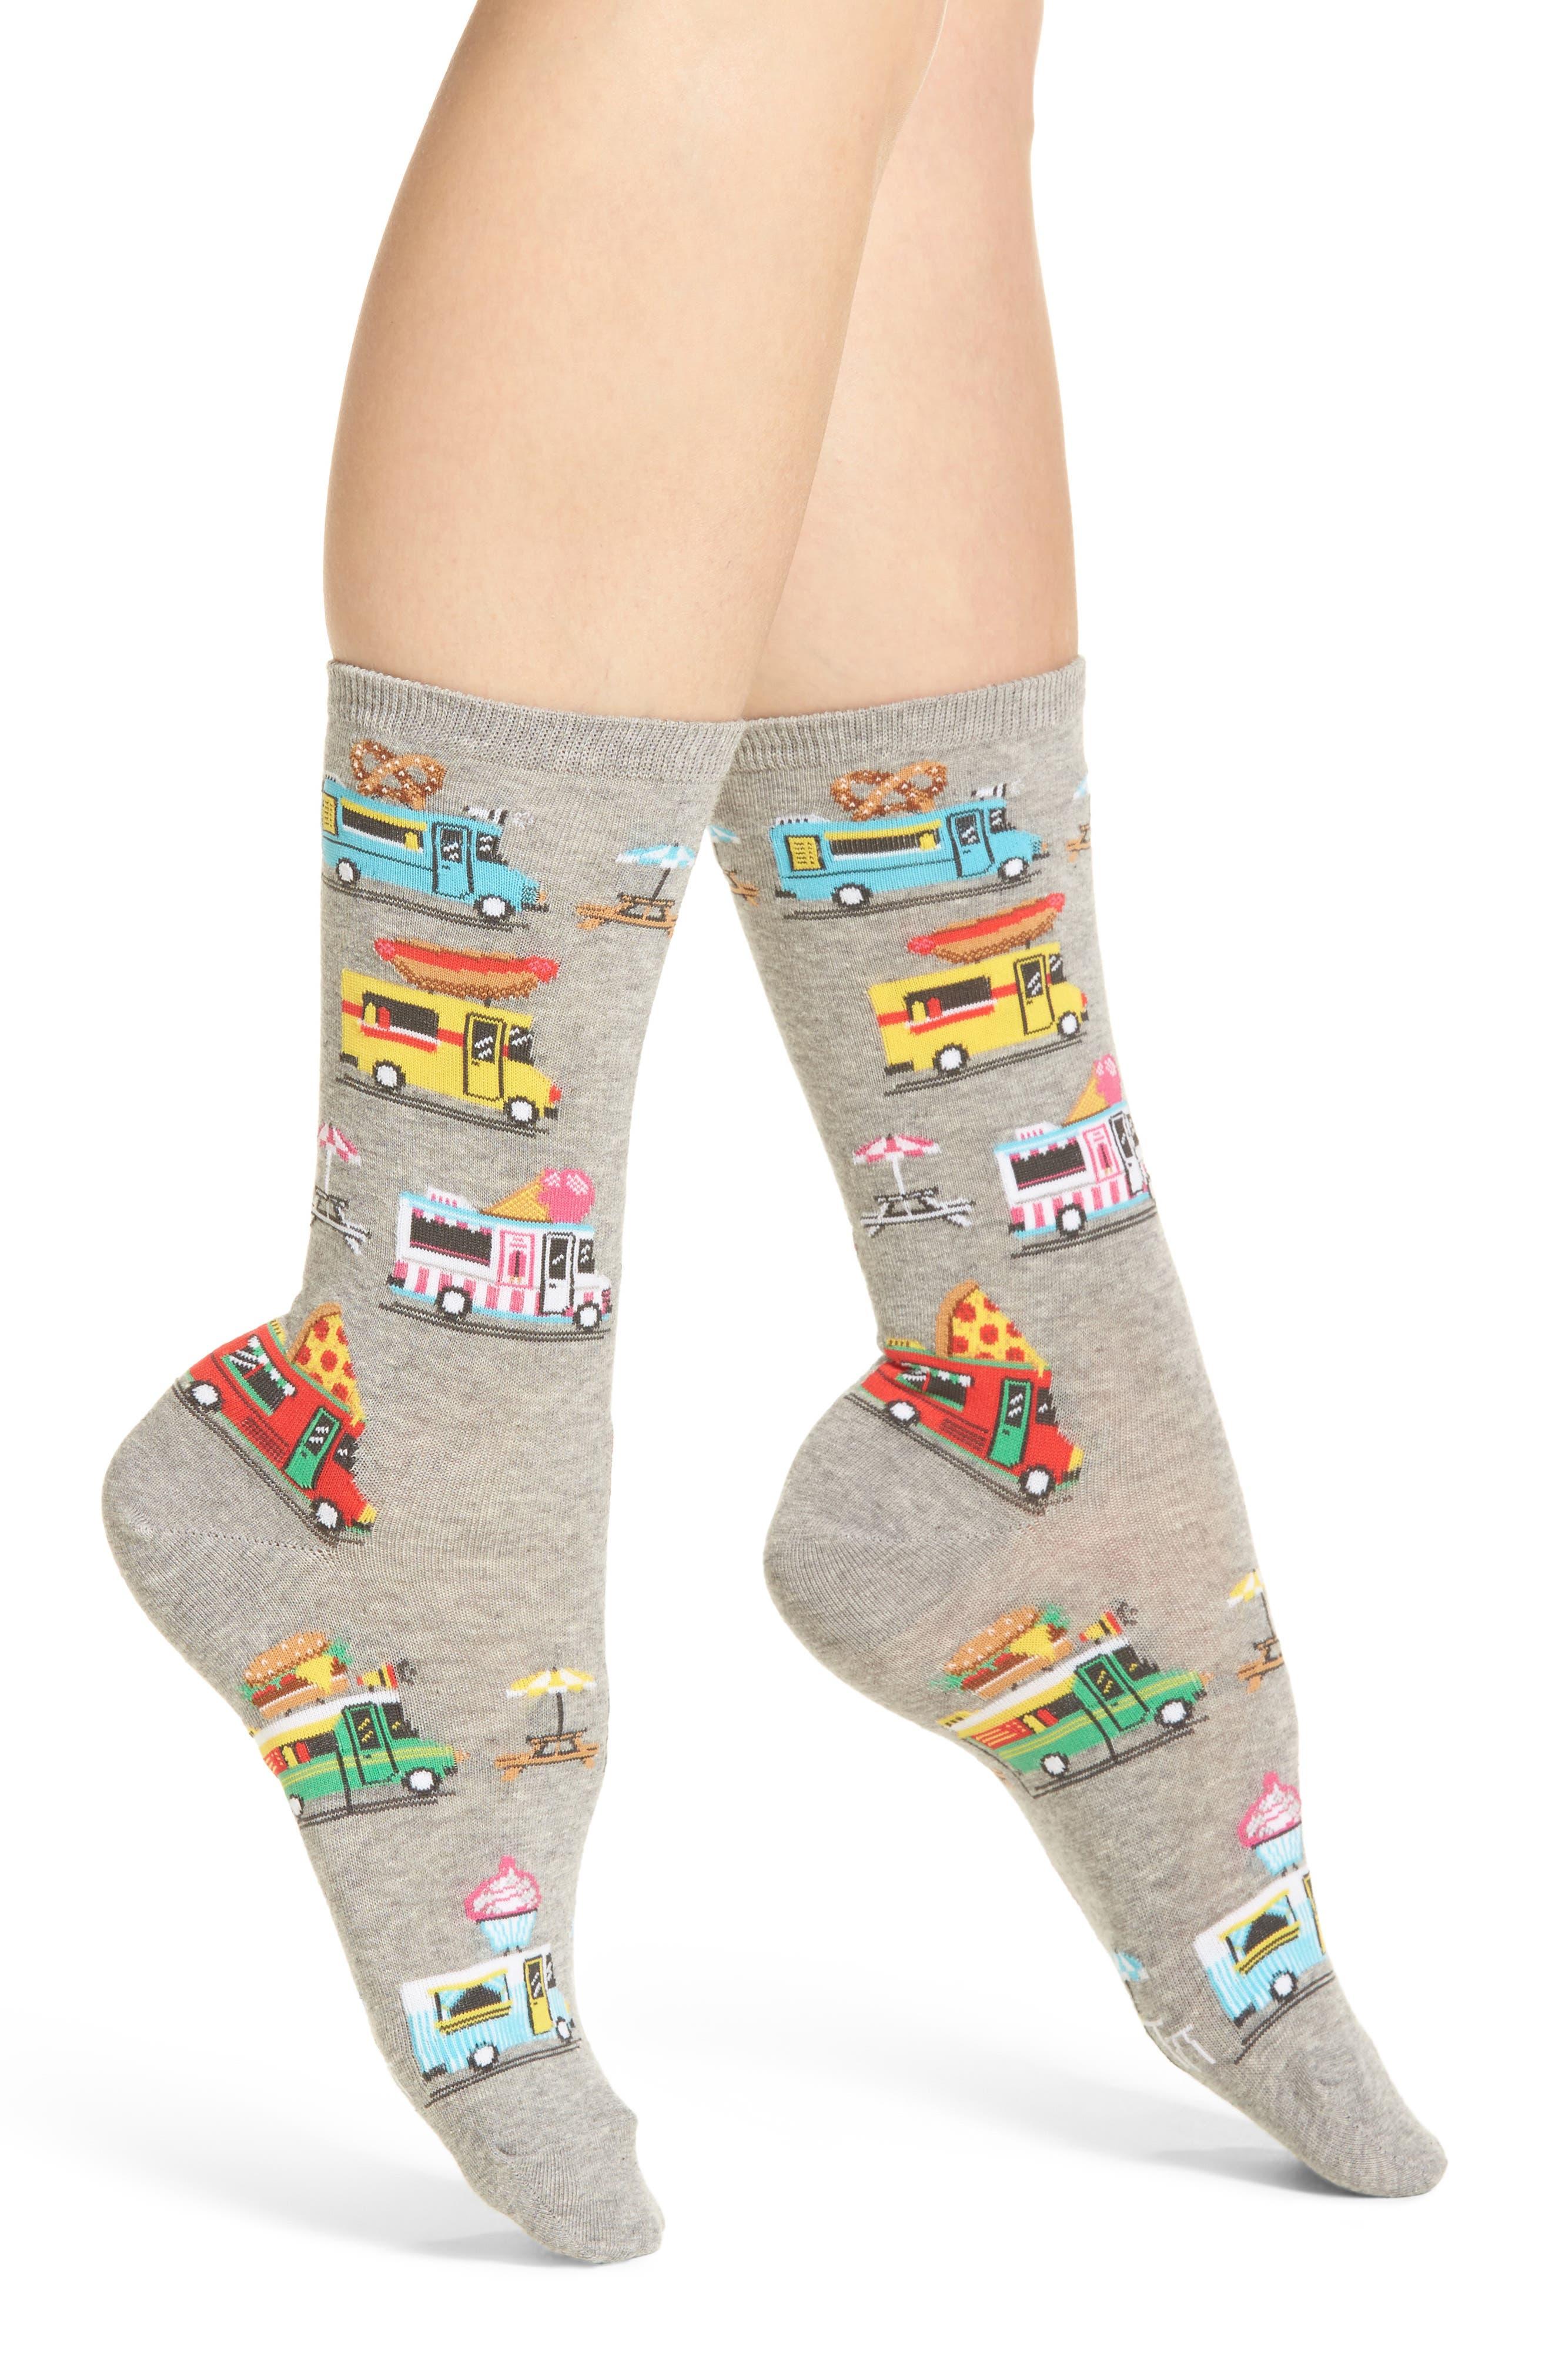 Hot Sox Food Trucks Crew Socks (3 for $15)